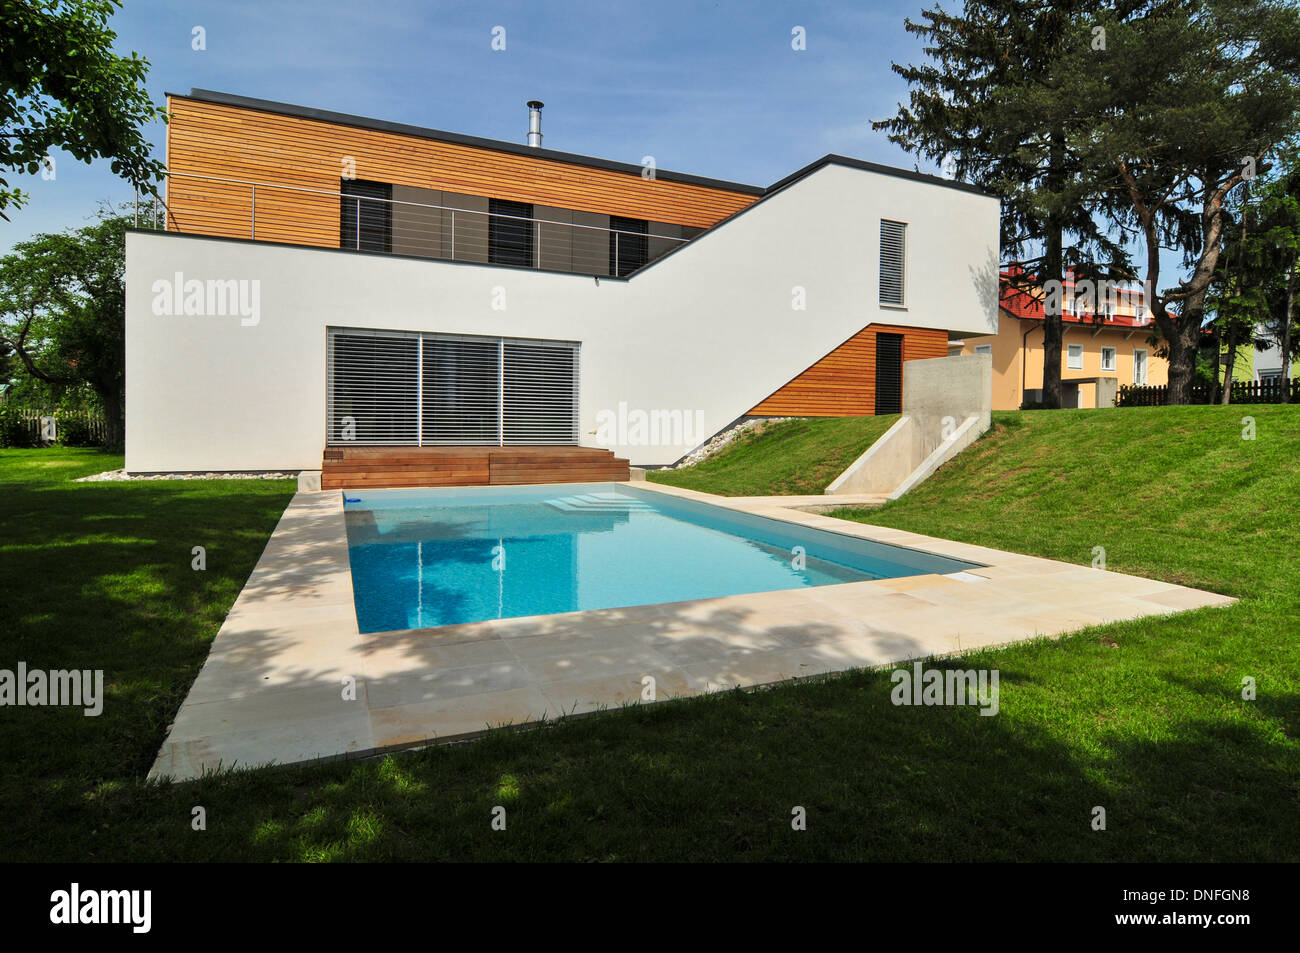 Wohnhaus Familie Troppmann, Einfamilienhaus, Haas Architektur, Swimming  Pool, Holzbau, Holzhaus,